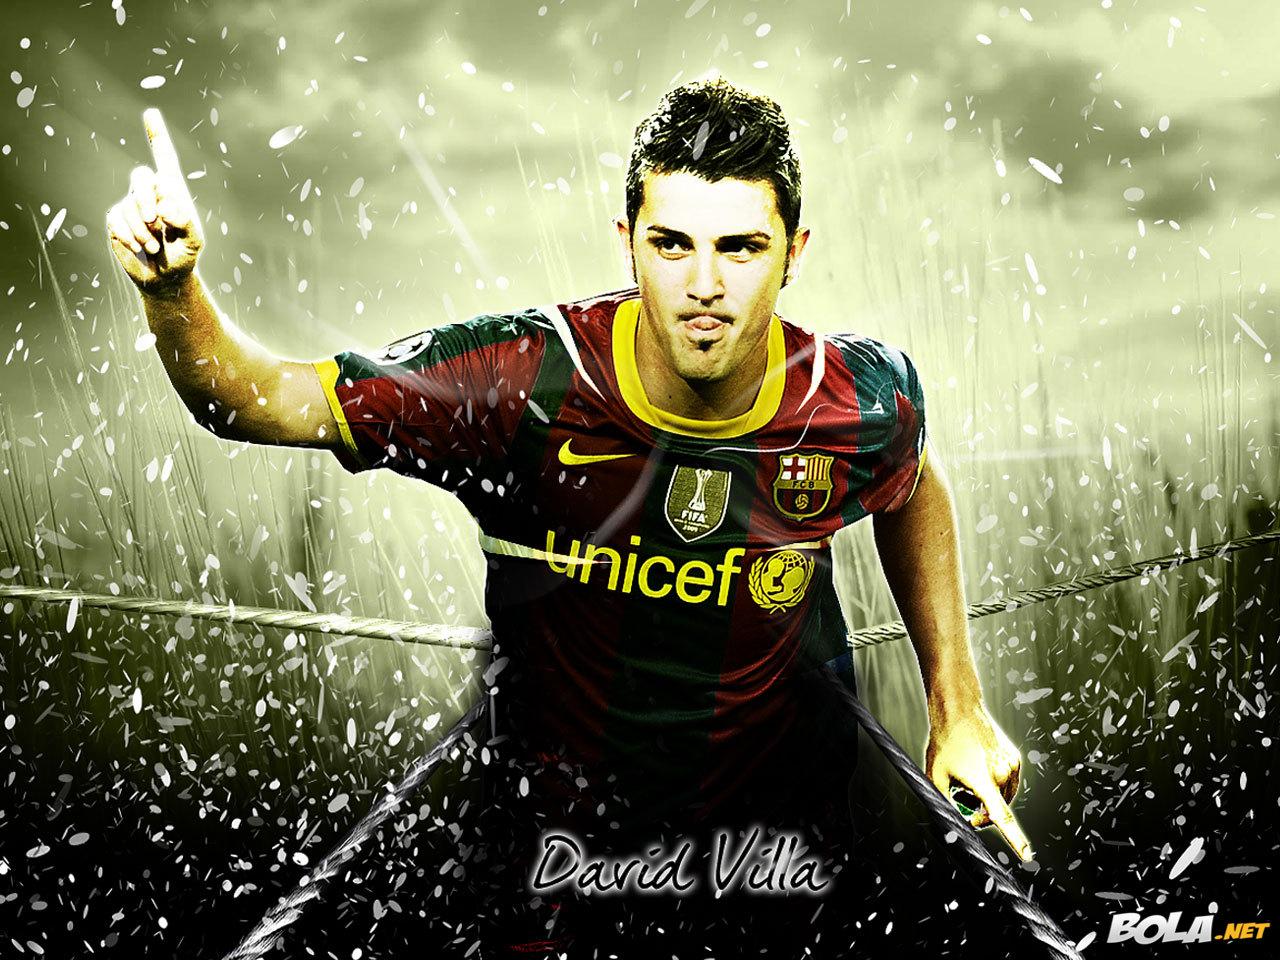 http://2.bp.blogspot.com/-SLgugNHy9WA/Tu_ZJEmlkTI/AAAAAAAAA9o/wHF3DMJjBxE/s1600/david+villa+barcelona+2011.jpg